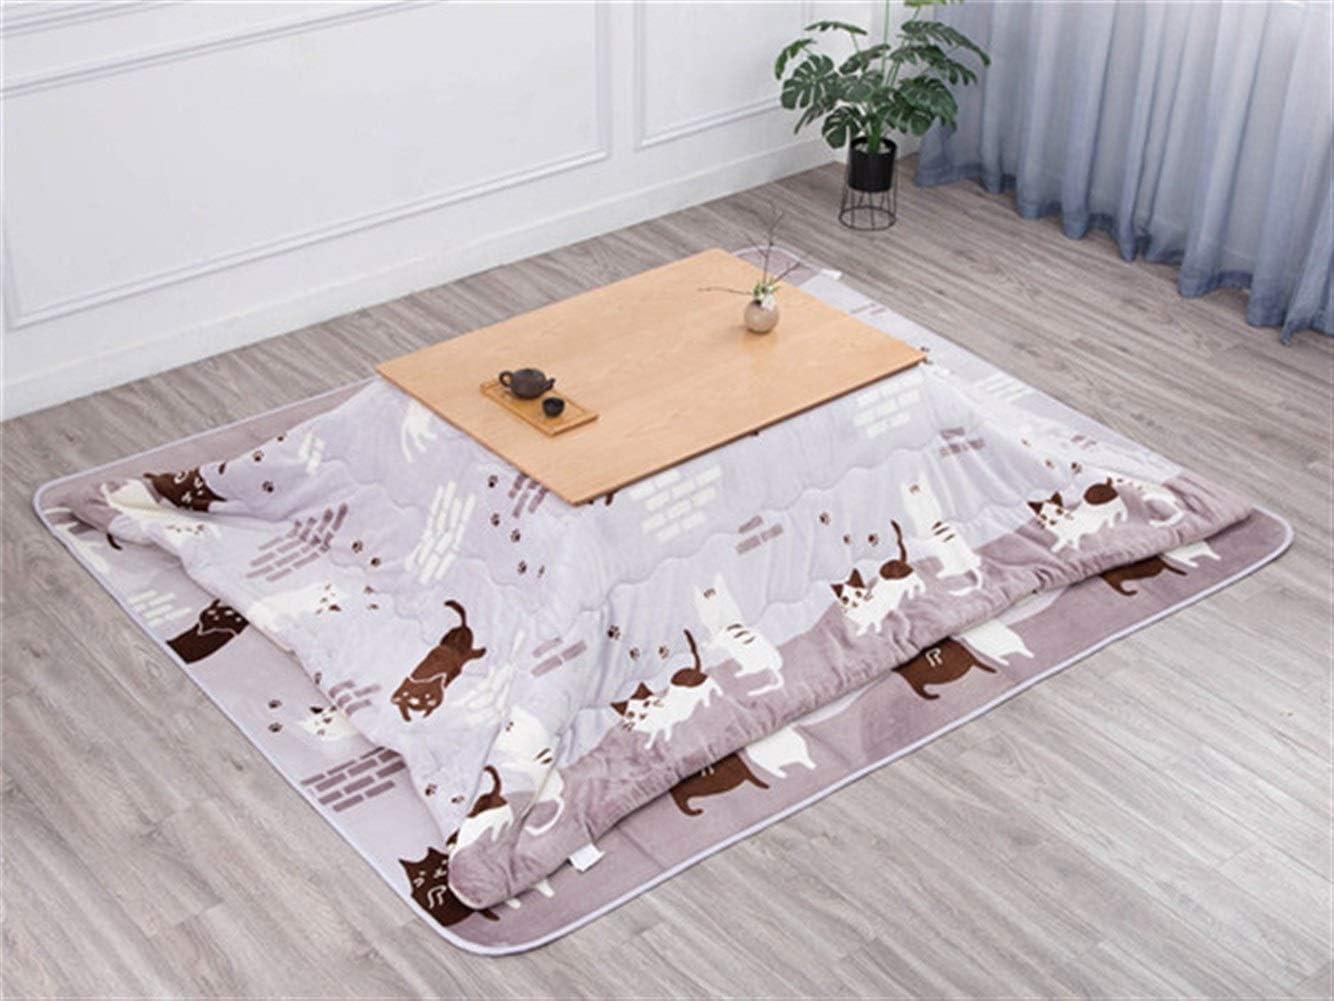 CharmingNight 2020 New Kotatsu Table Nordic Design Solid Oak Wood Japanese Furniture for Living Room Casual Heated Center Tea Tatami Table Creativity (Color : Natural Set)